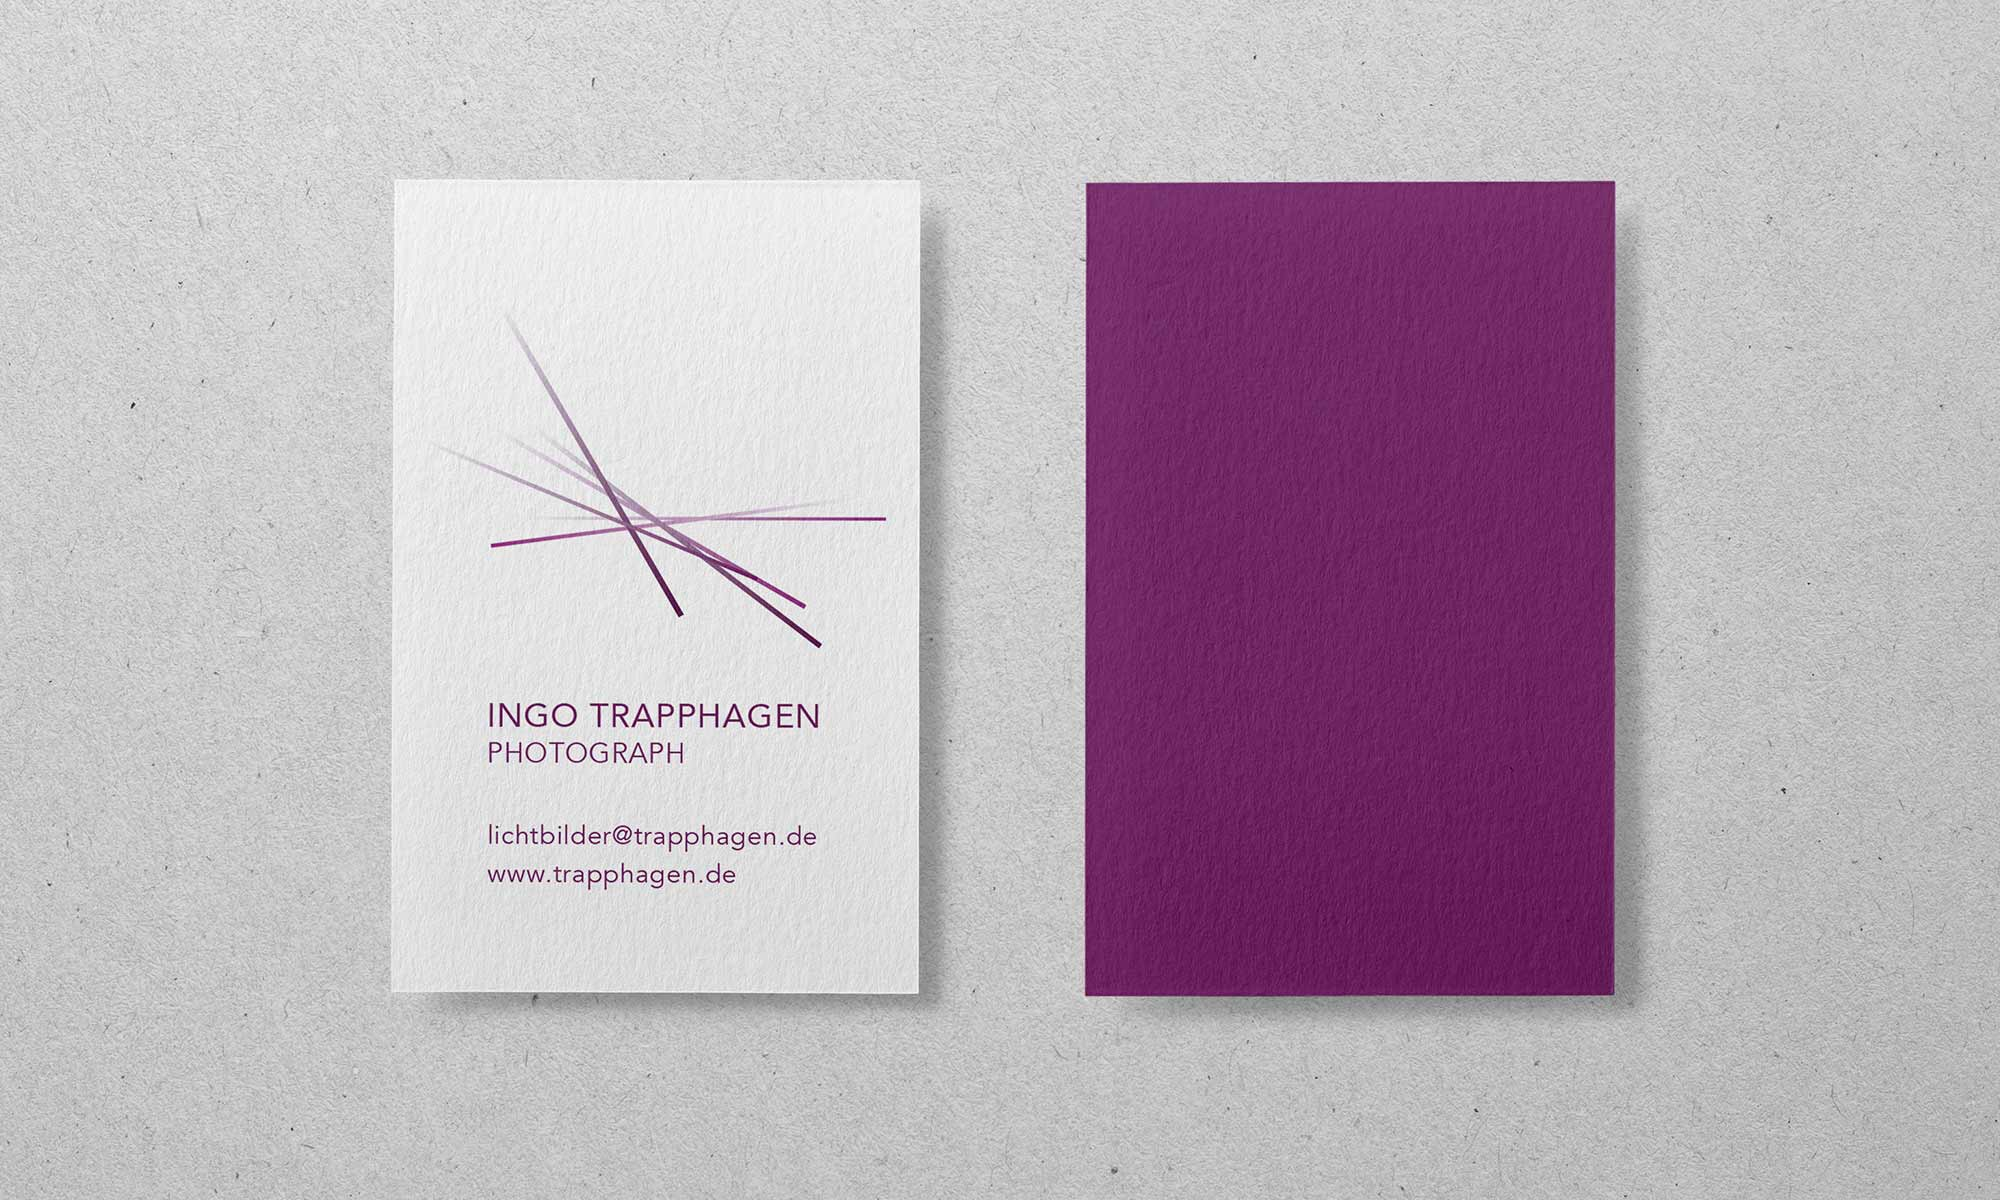 Corporate Design Photograph Visitenkarte